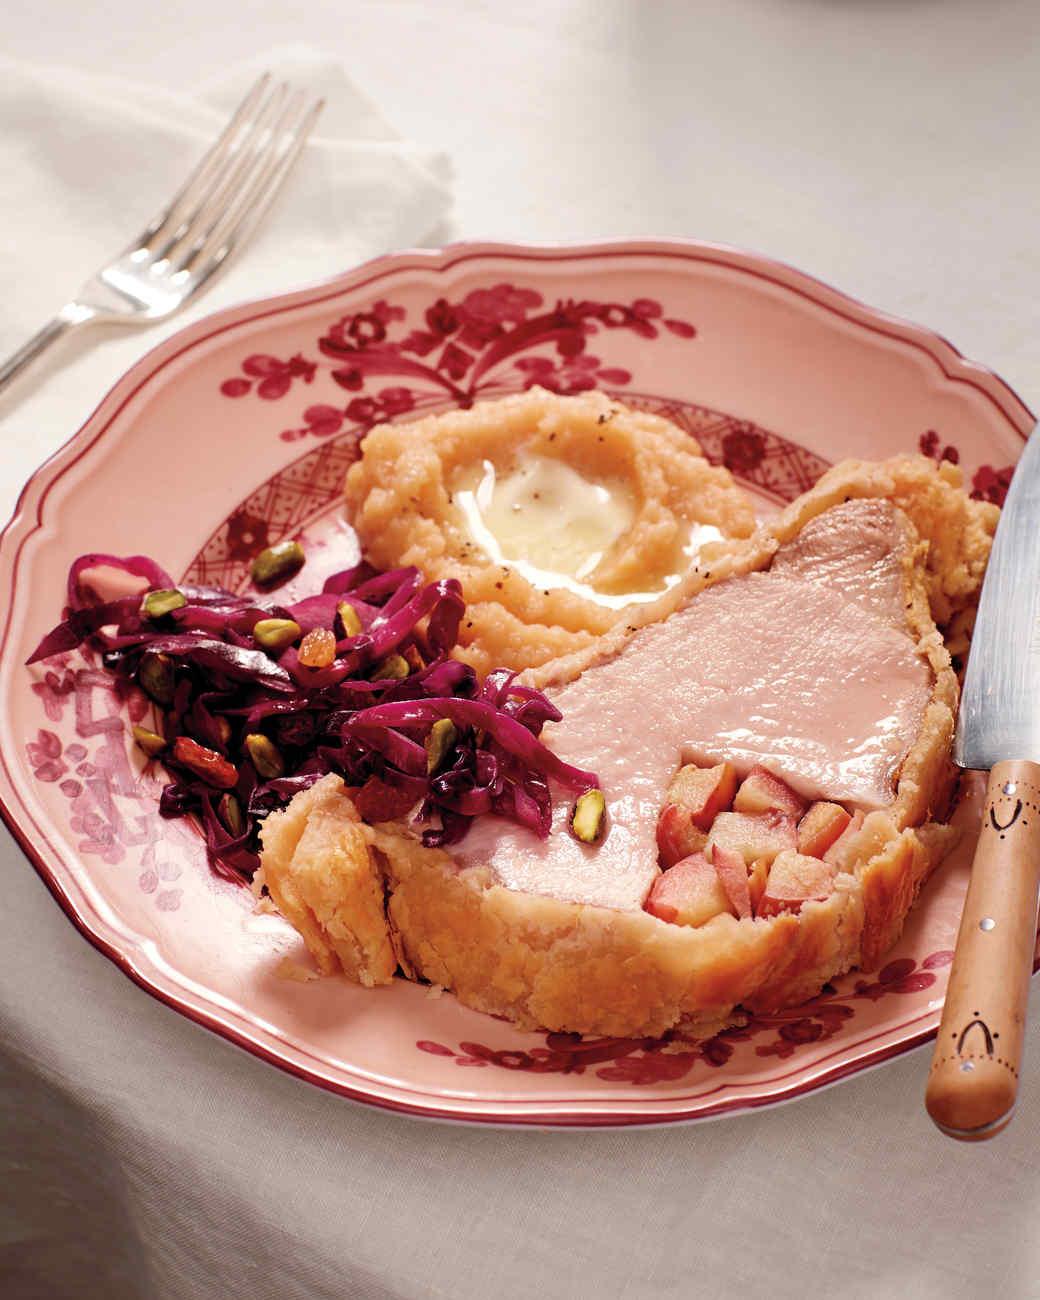 apple-stuffed-pork-wellington-plated-019-d112520.jpg